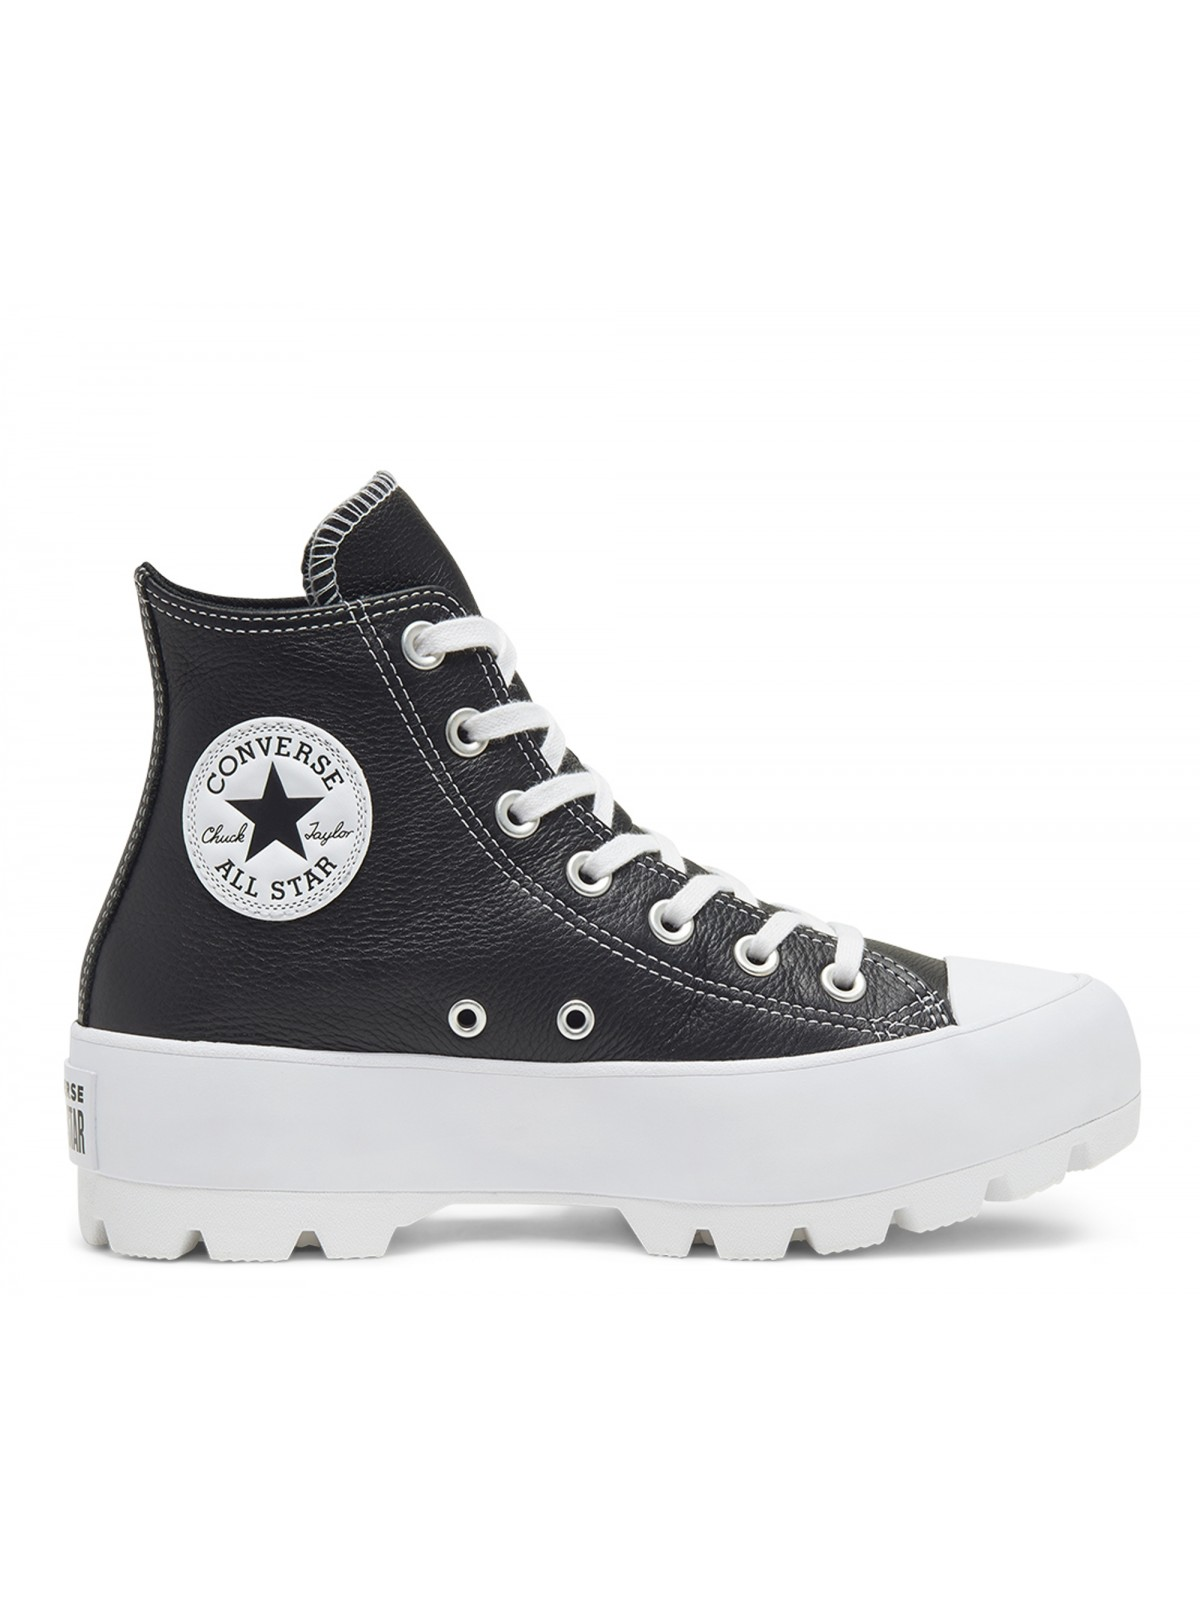 Converse Chuck Taylor all star  Lugged cuir plateforme noir